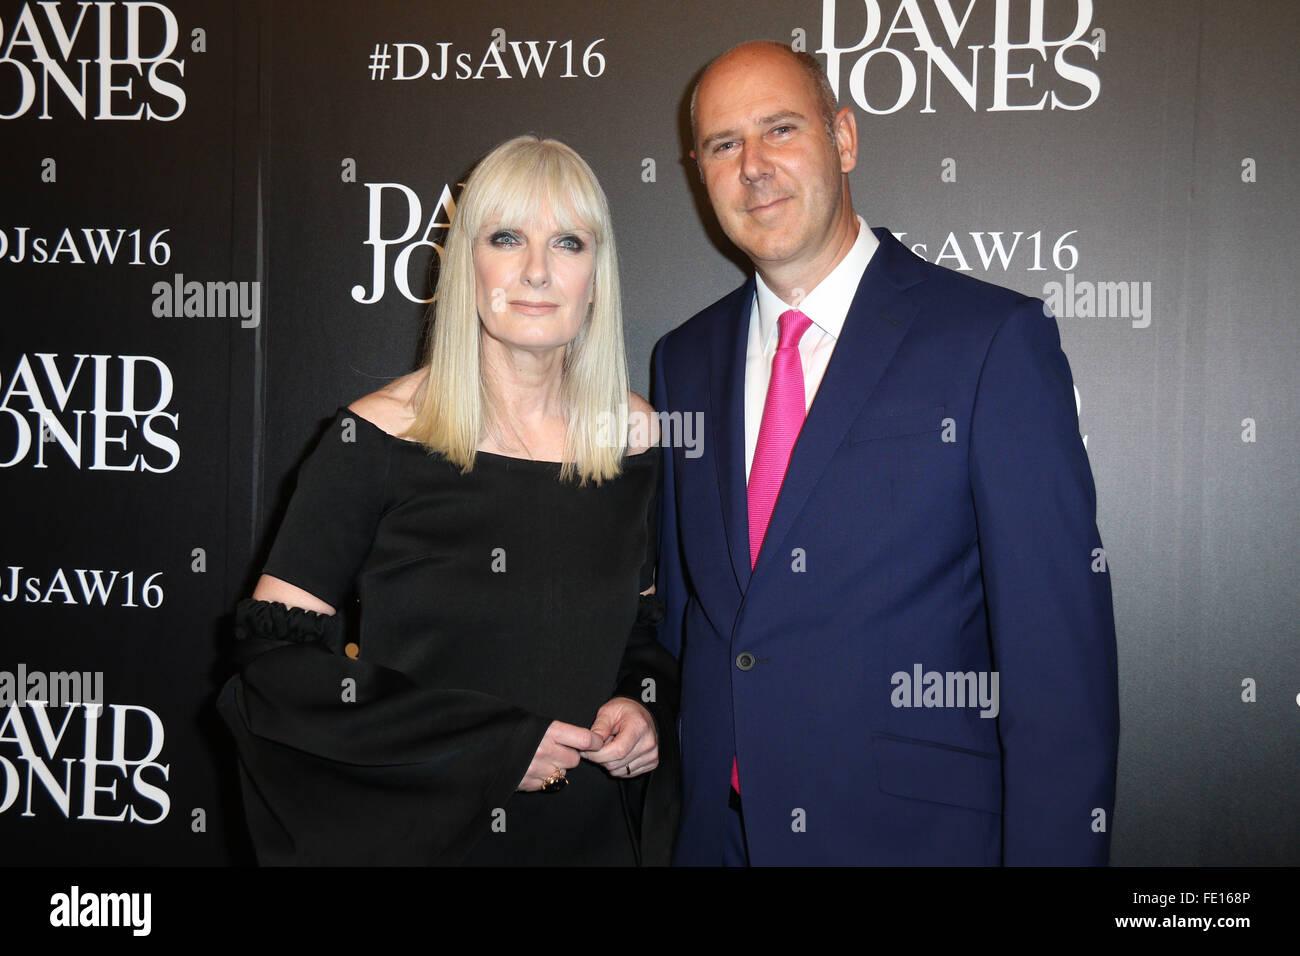 388f3fcdf4498 Donna Player and David Jones CEO John Dixon arrive at the David Jones  Autumn/Winter 2016 Collection Launch at David Jones Elizabeth Street Store.